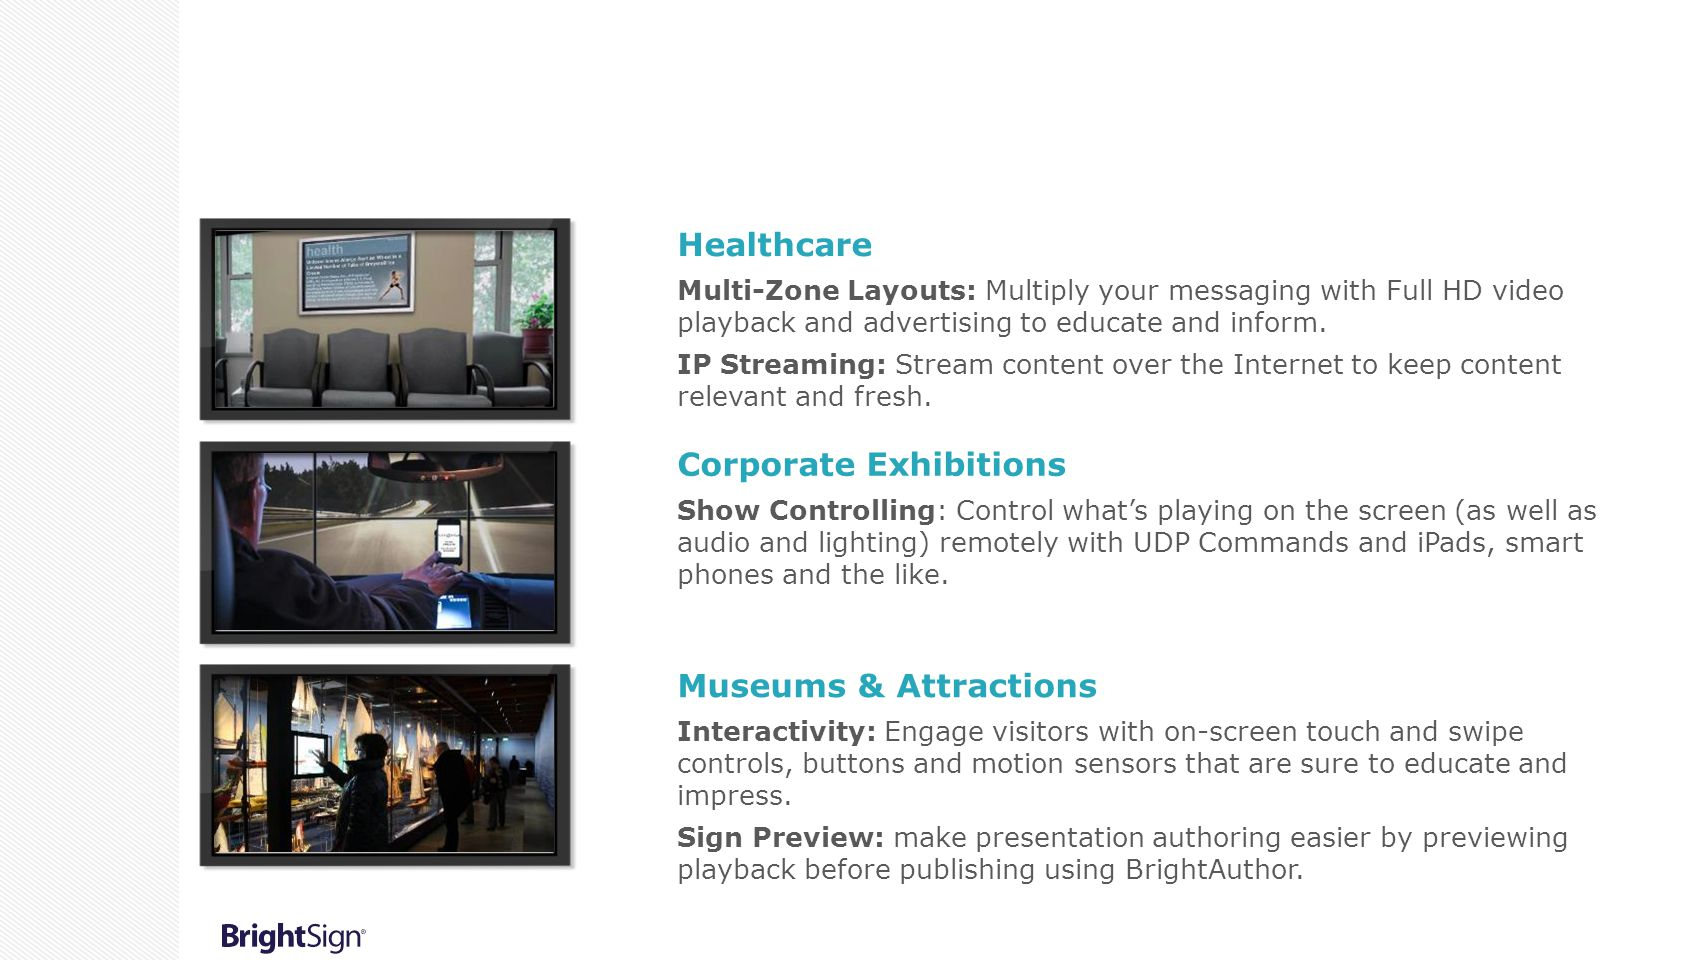 Corporate Exhibitions